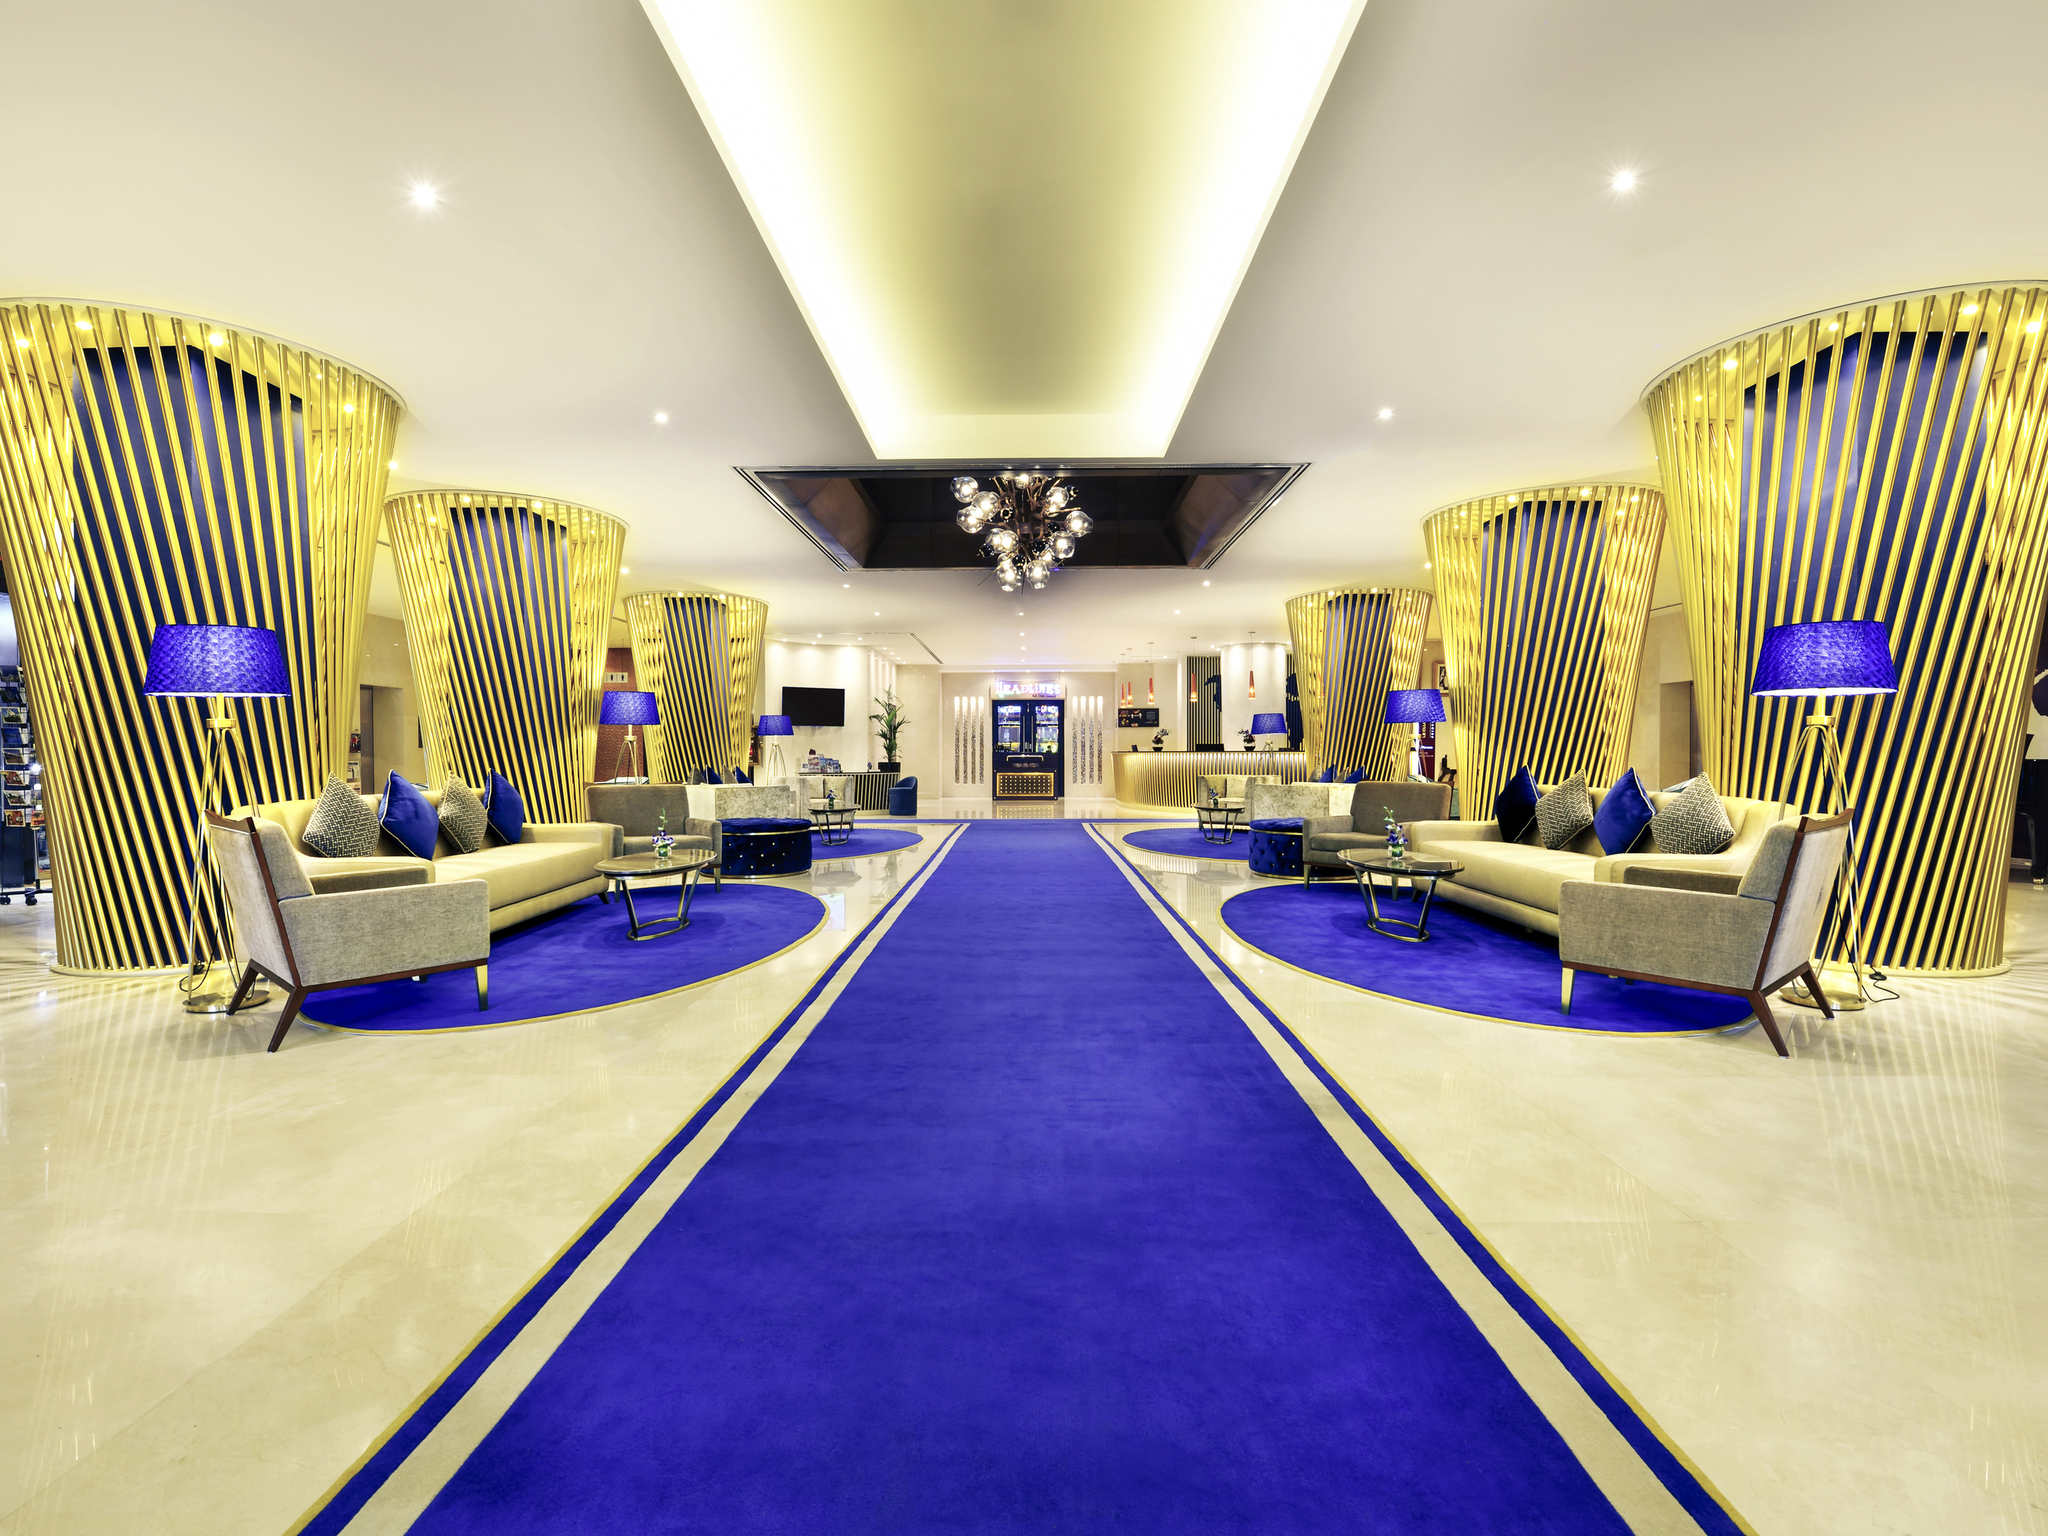 فندق - فندق مركيور Mercure جولد طريق المينا دبي